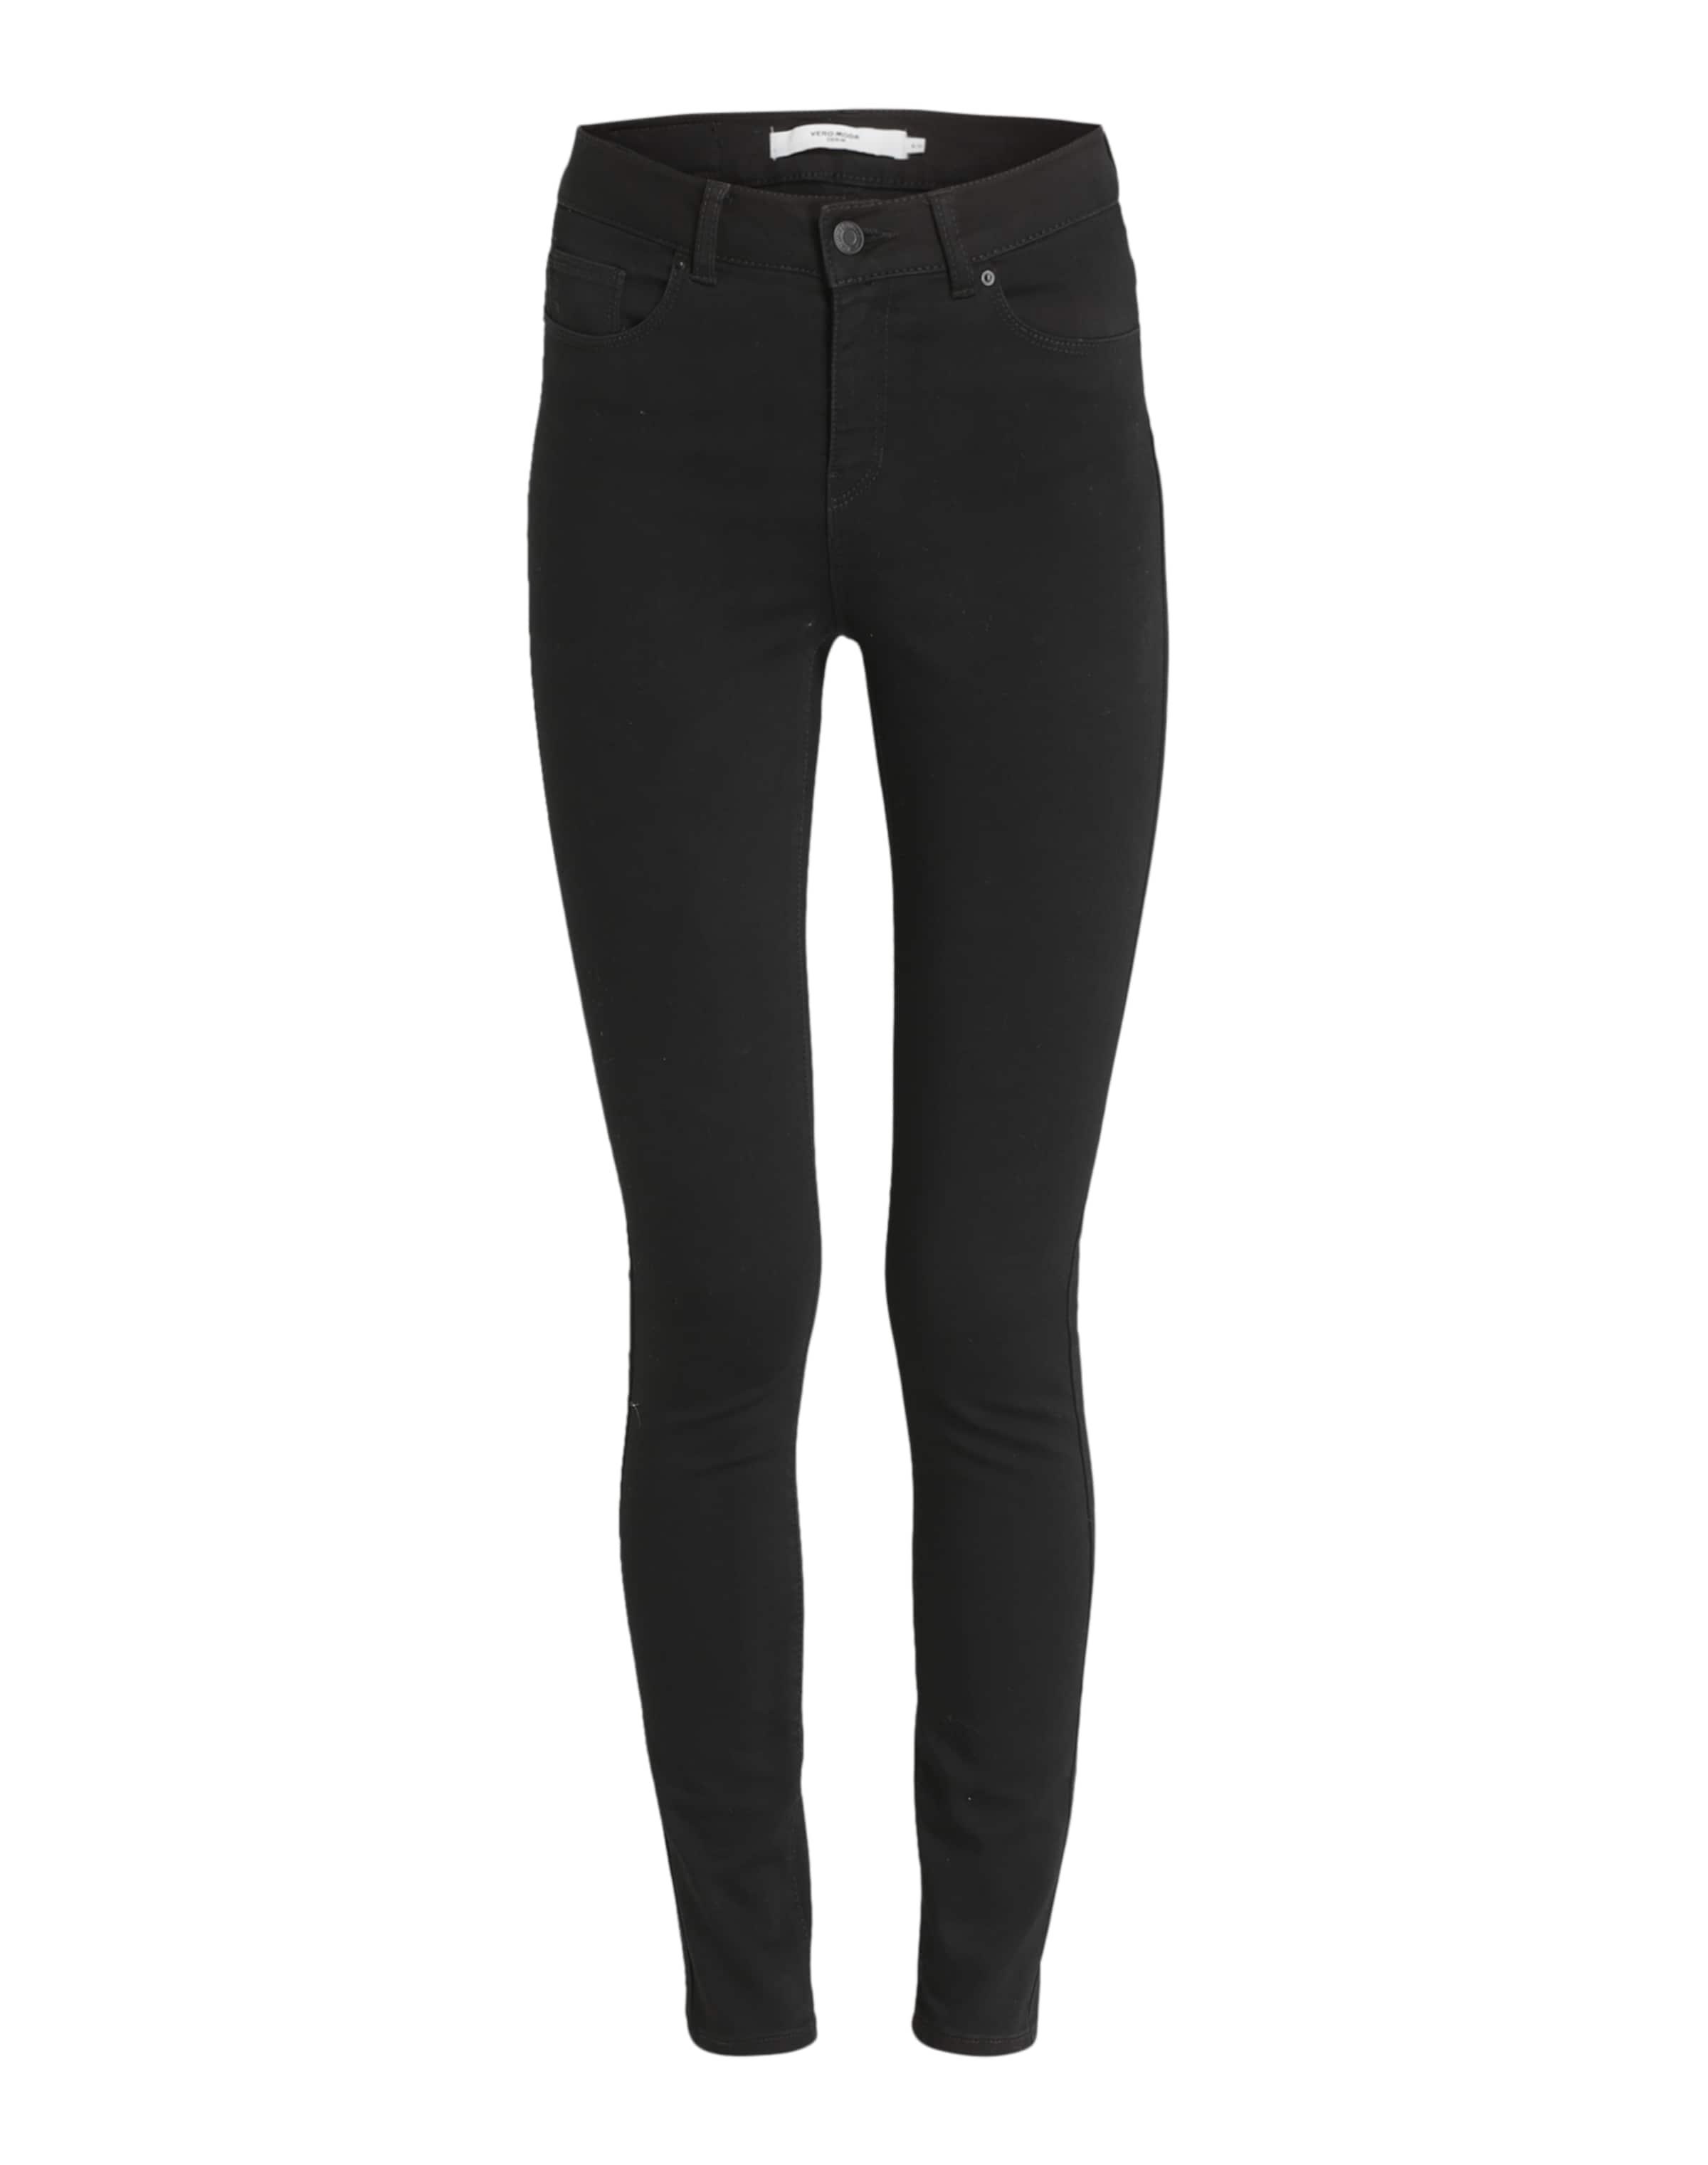 VERO MODA High Waist Skinny Jeans 'VMNine' Am Besten Zu Verkaufen Rabatt-Spielraum Store JGAOjCTZj